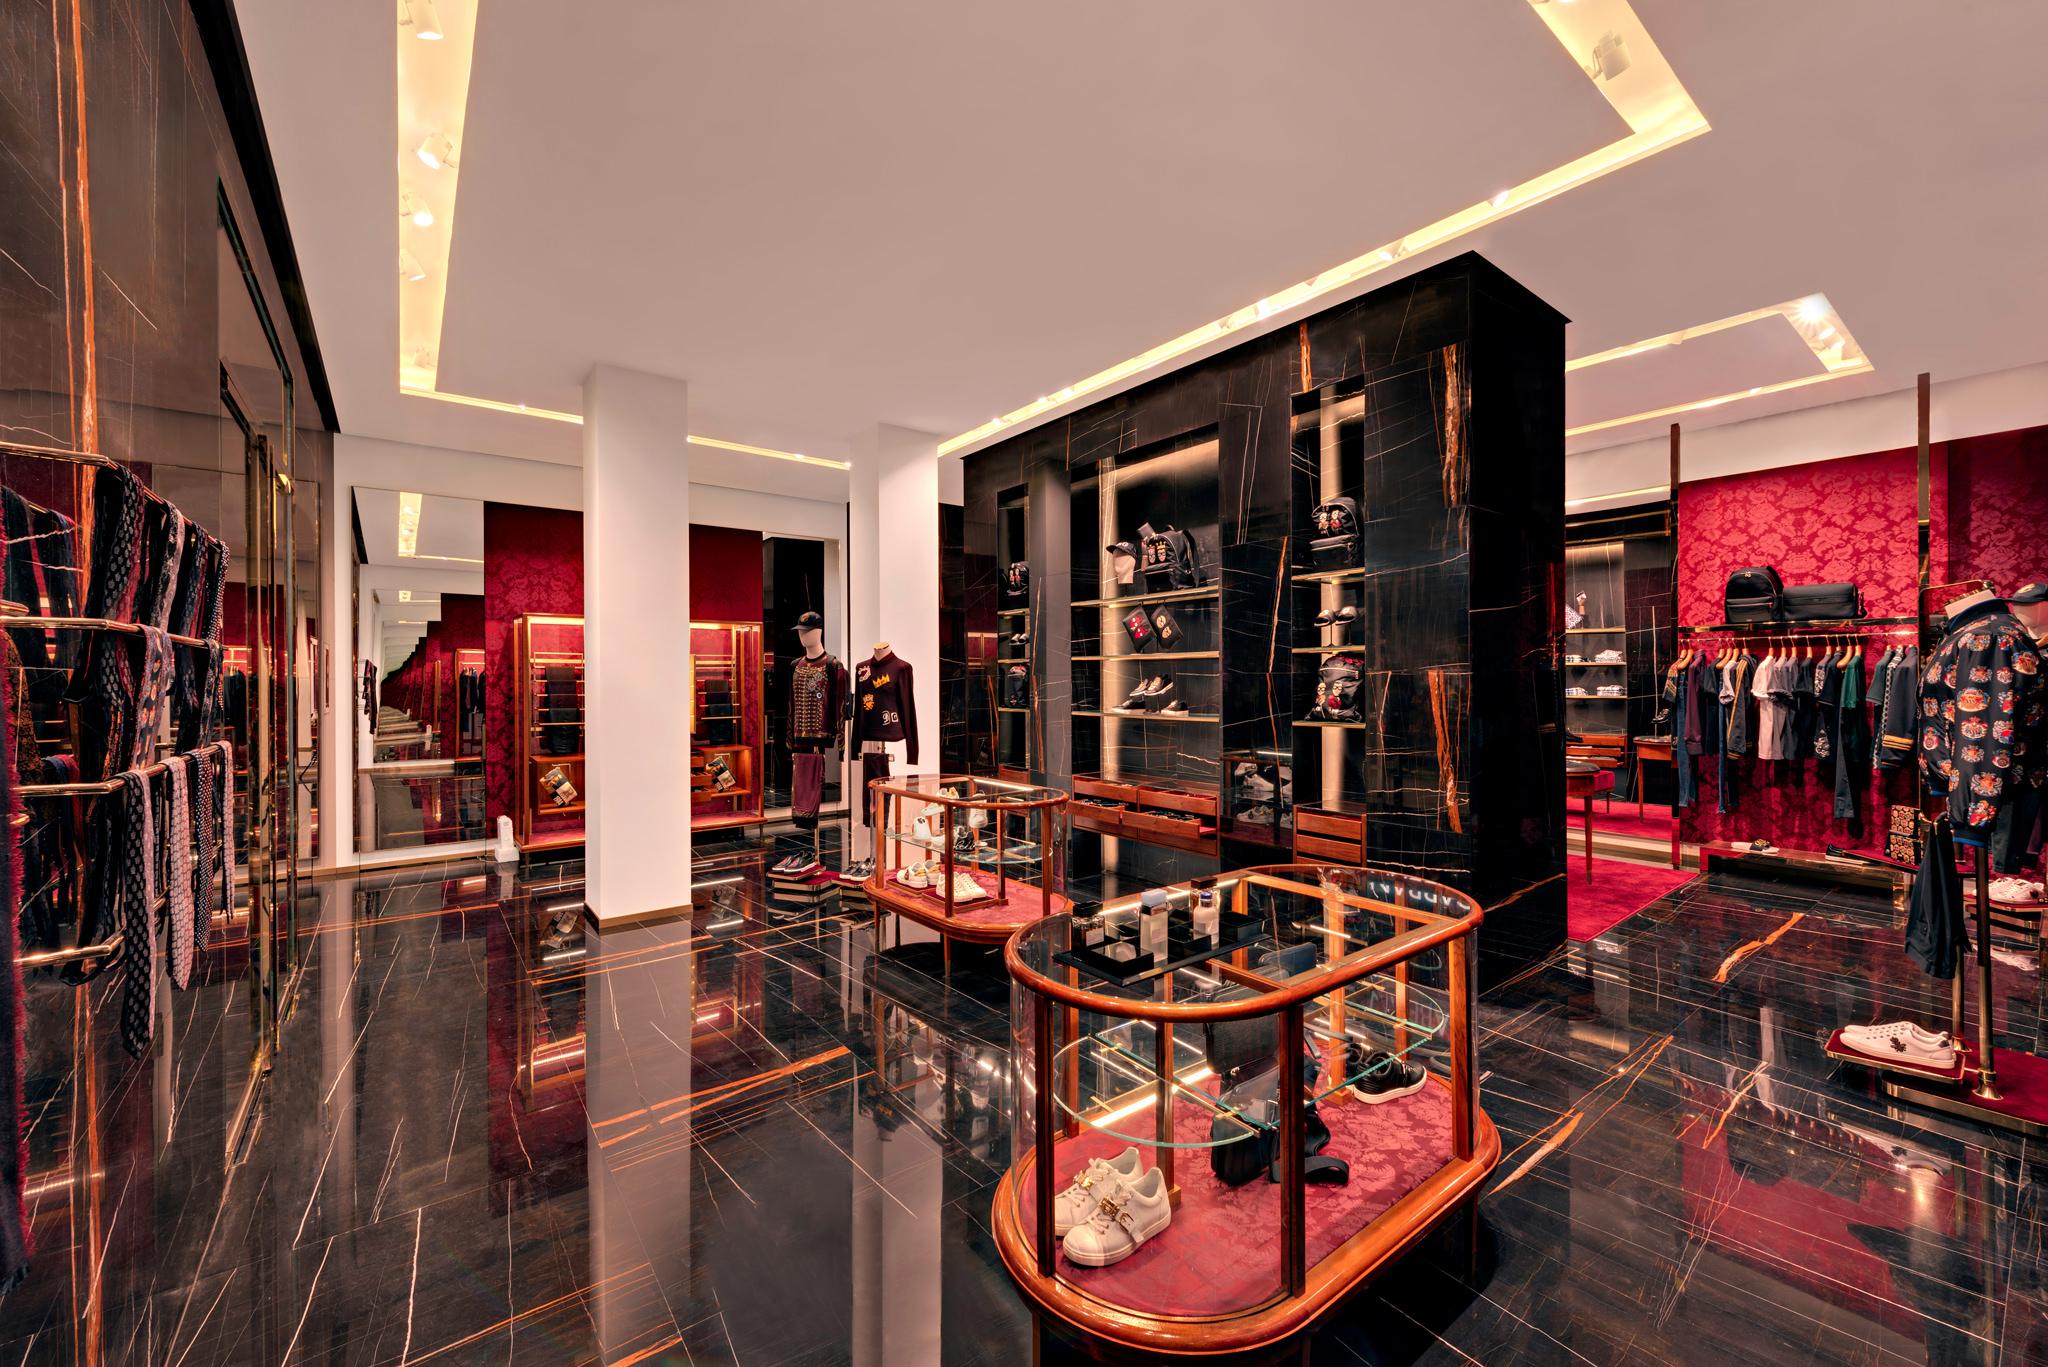 20171011 - Dolce & Gabbana - HCM - Commercial - Interior - Store - Retouch 0001.jpg